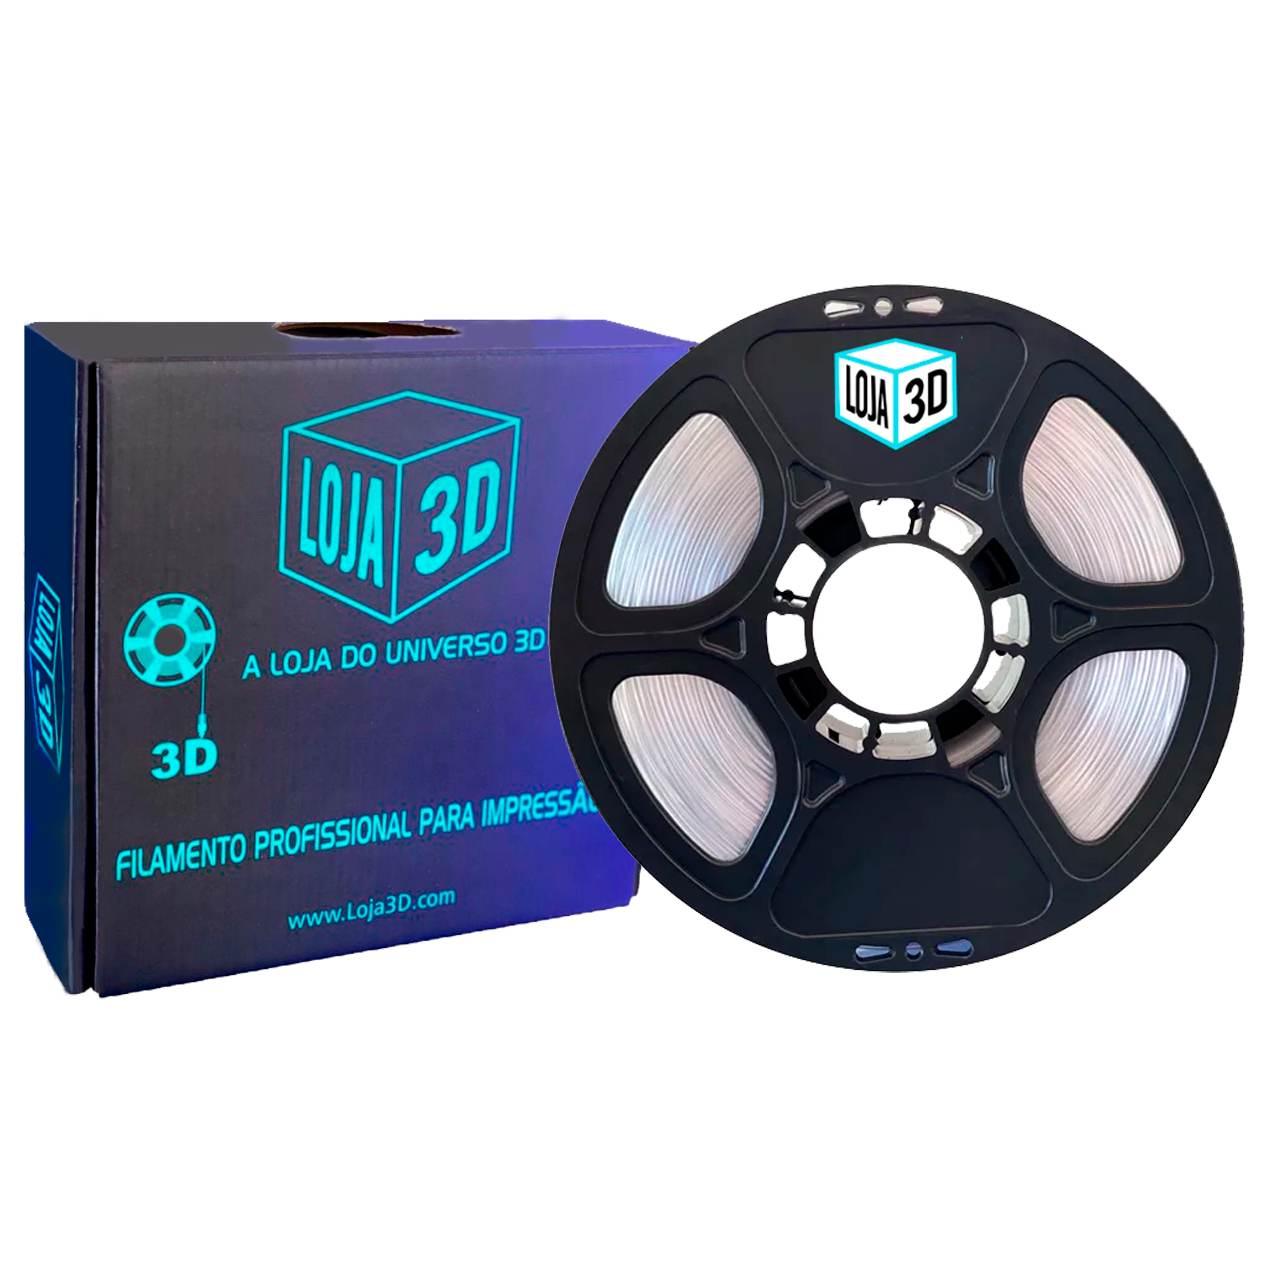 Filamento PET-G Pro - Cristal - Translúcido - Loja 3D - 1.75mm - 1kg